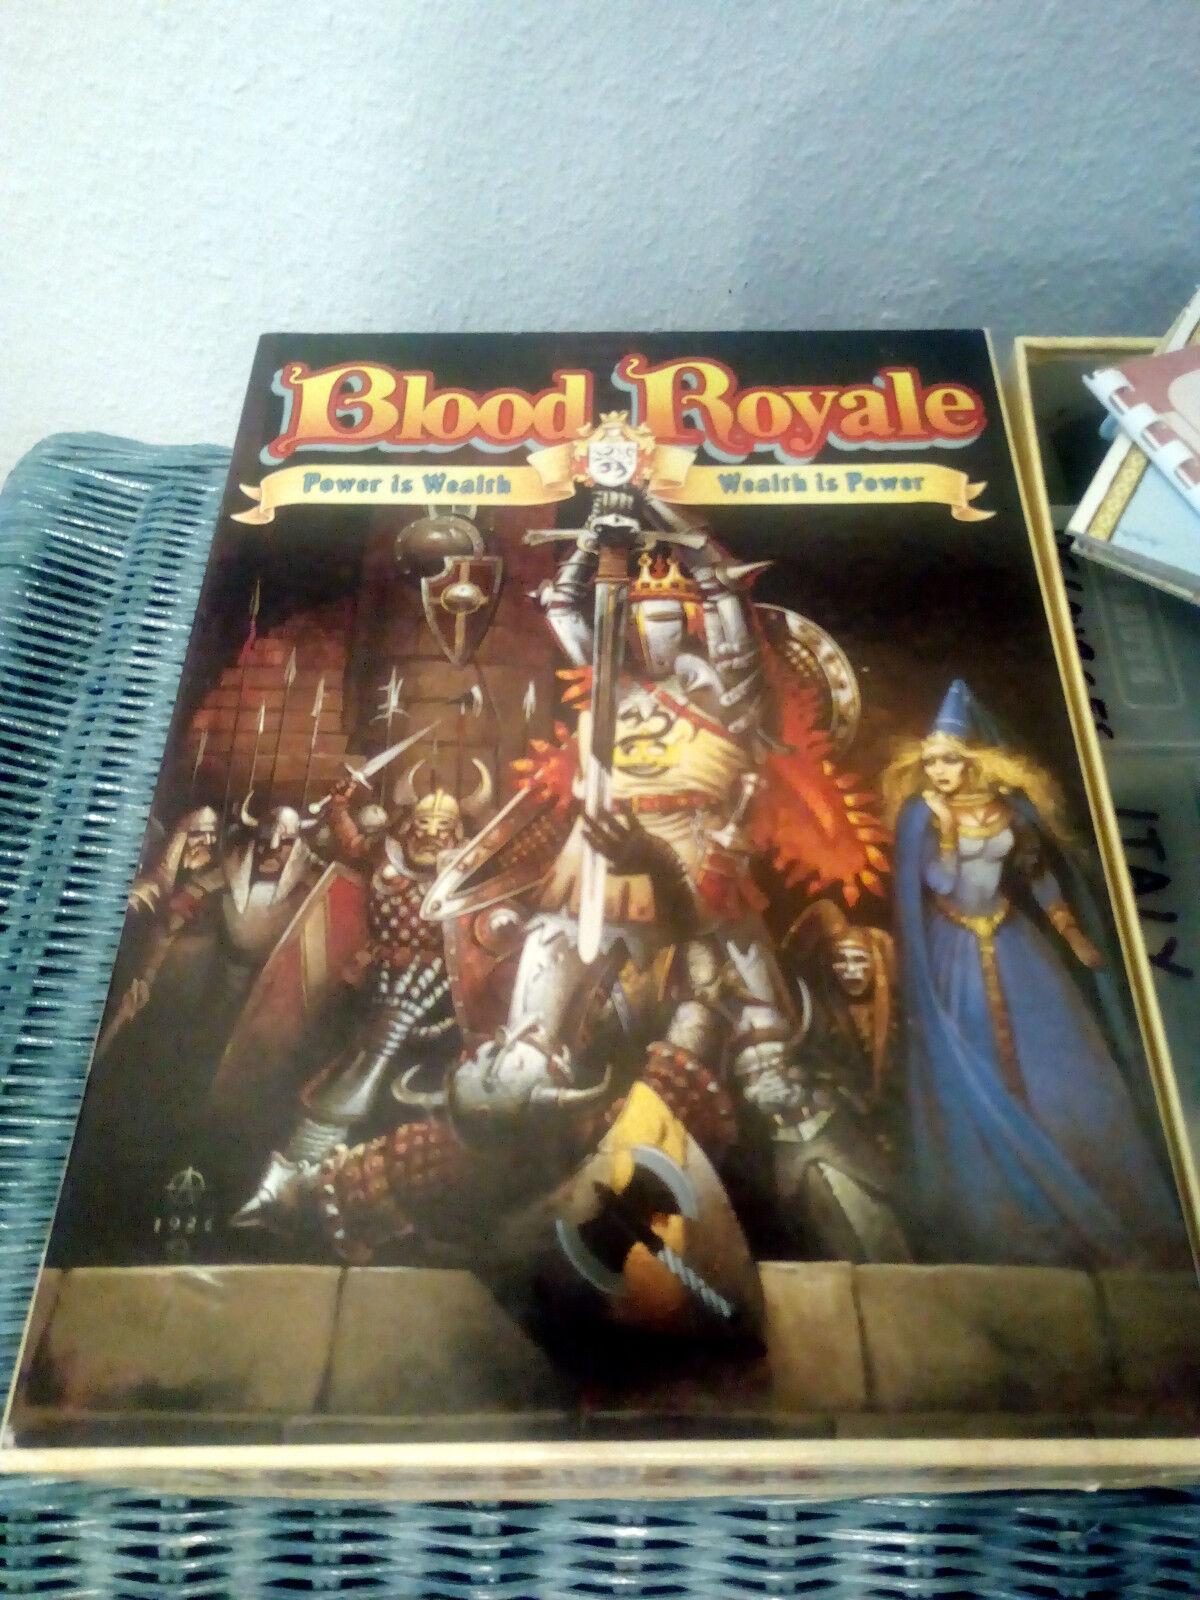 Blood Royale Fantasy Board game by Games Workshop (1987) UNIQUEMENT POUR Hardcore Gamer